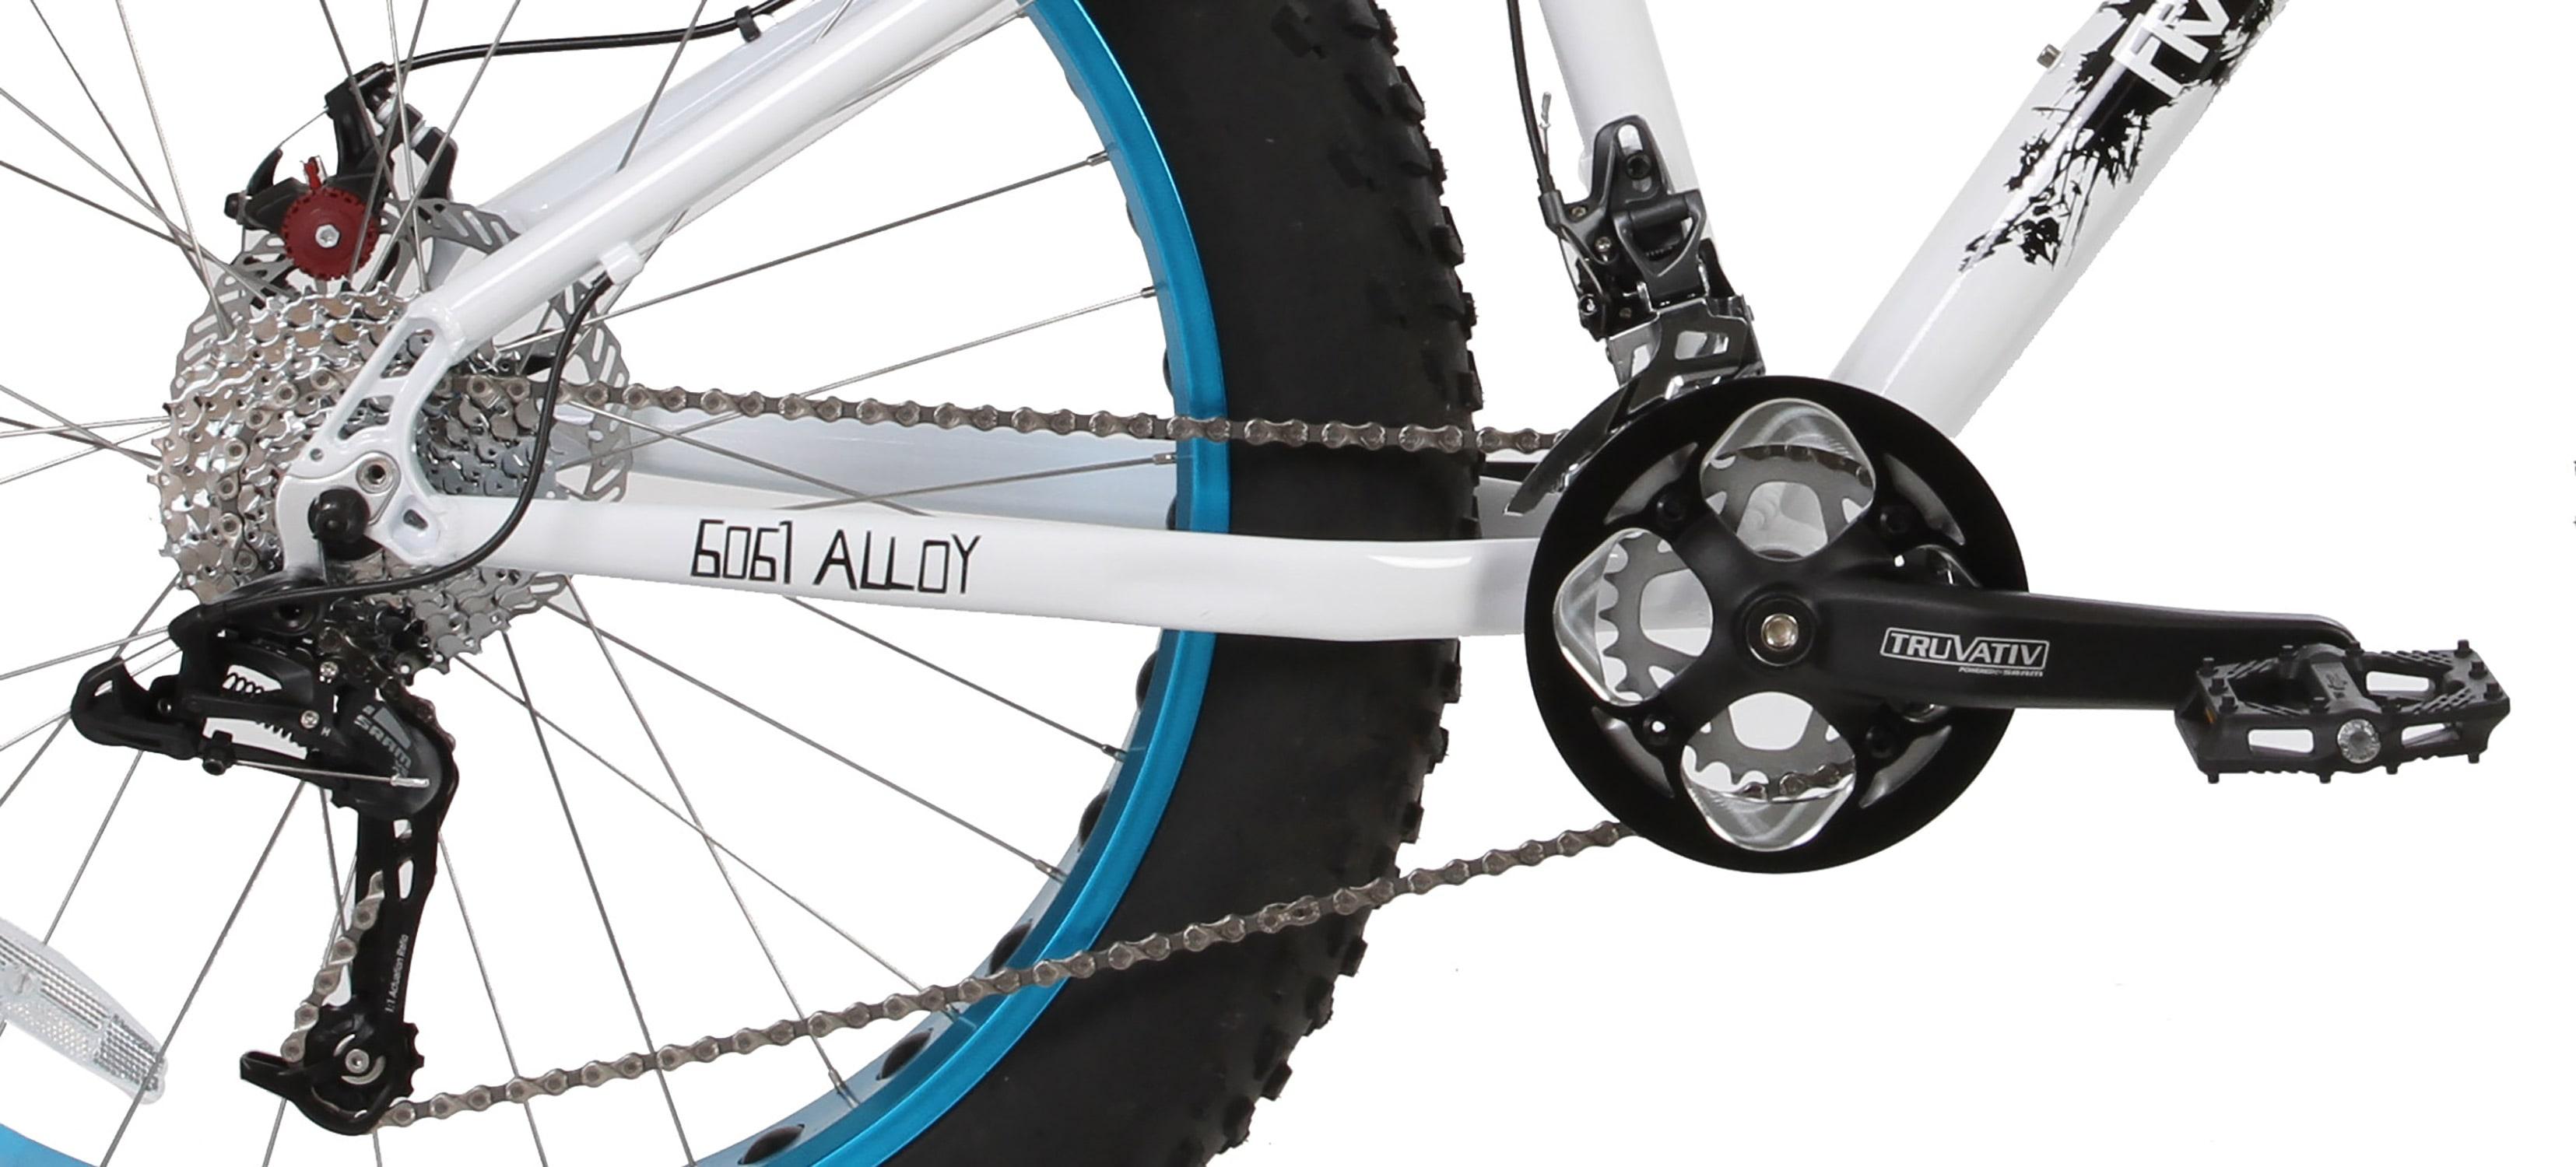 On Sale Framed Minnesota 2.0 Fat Bike - Womens up to 50% off